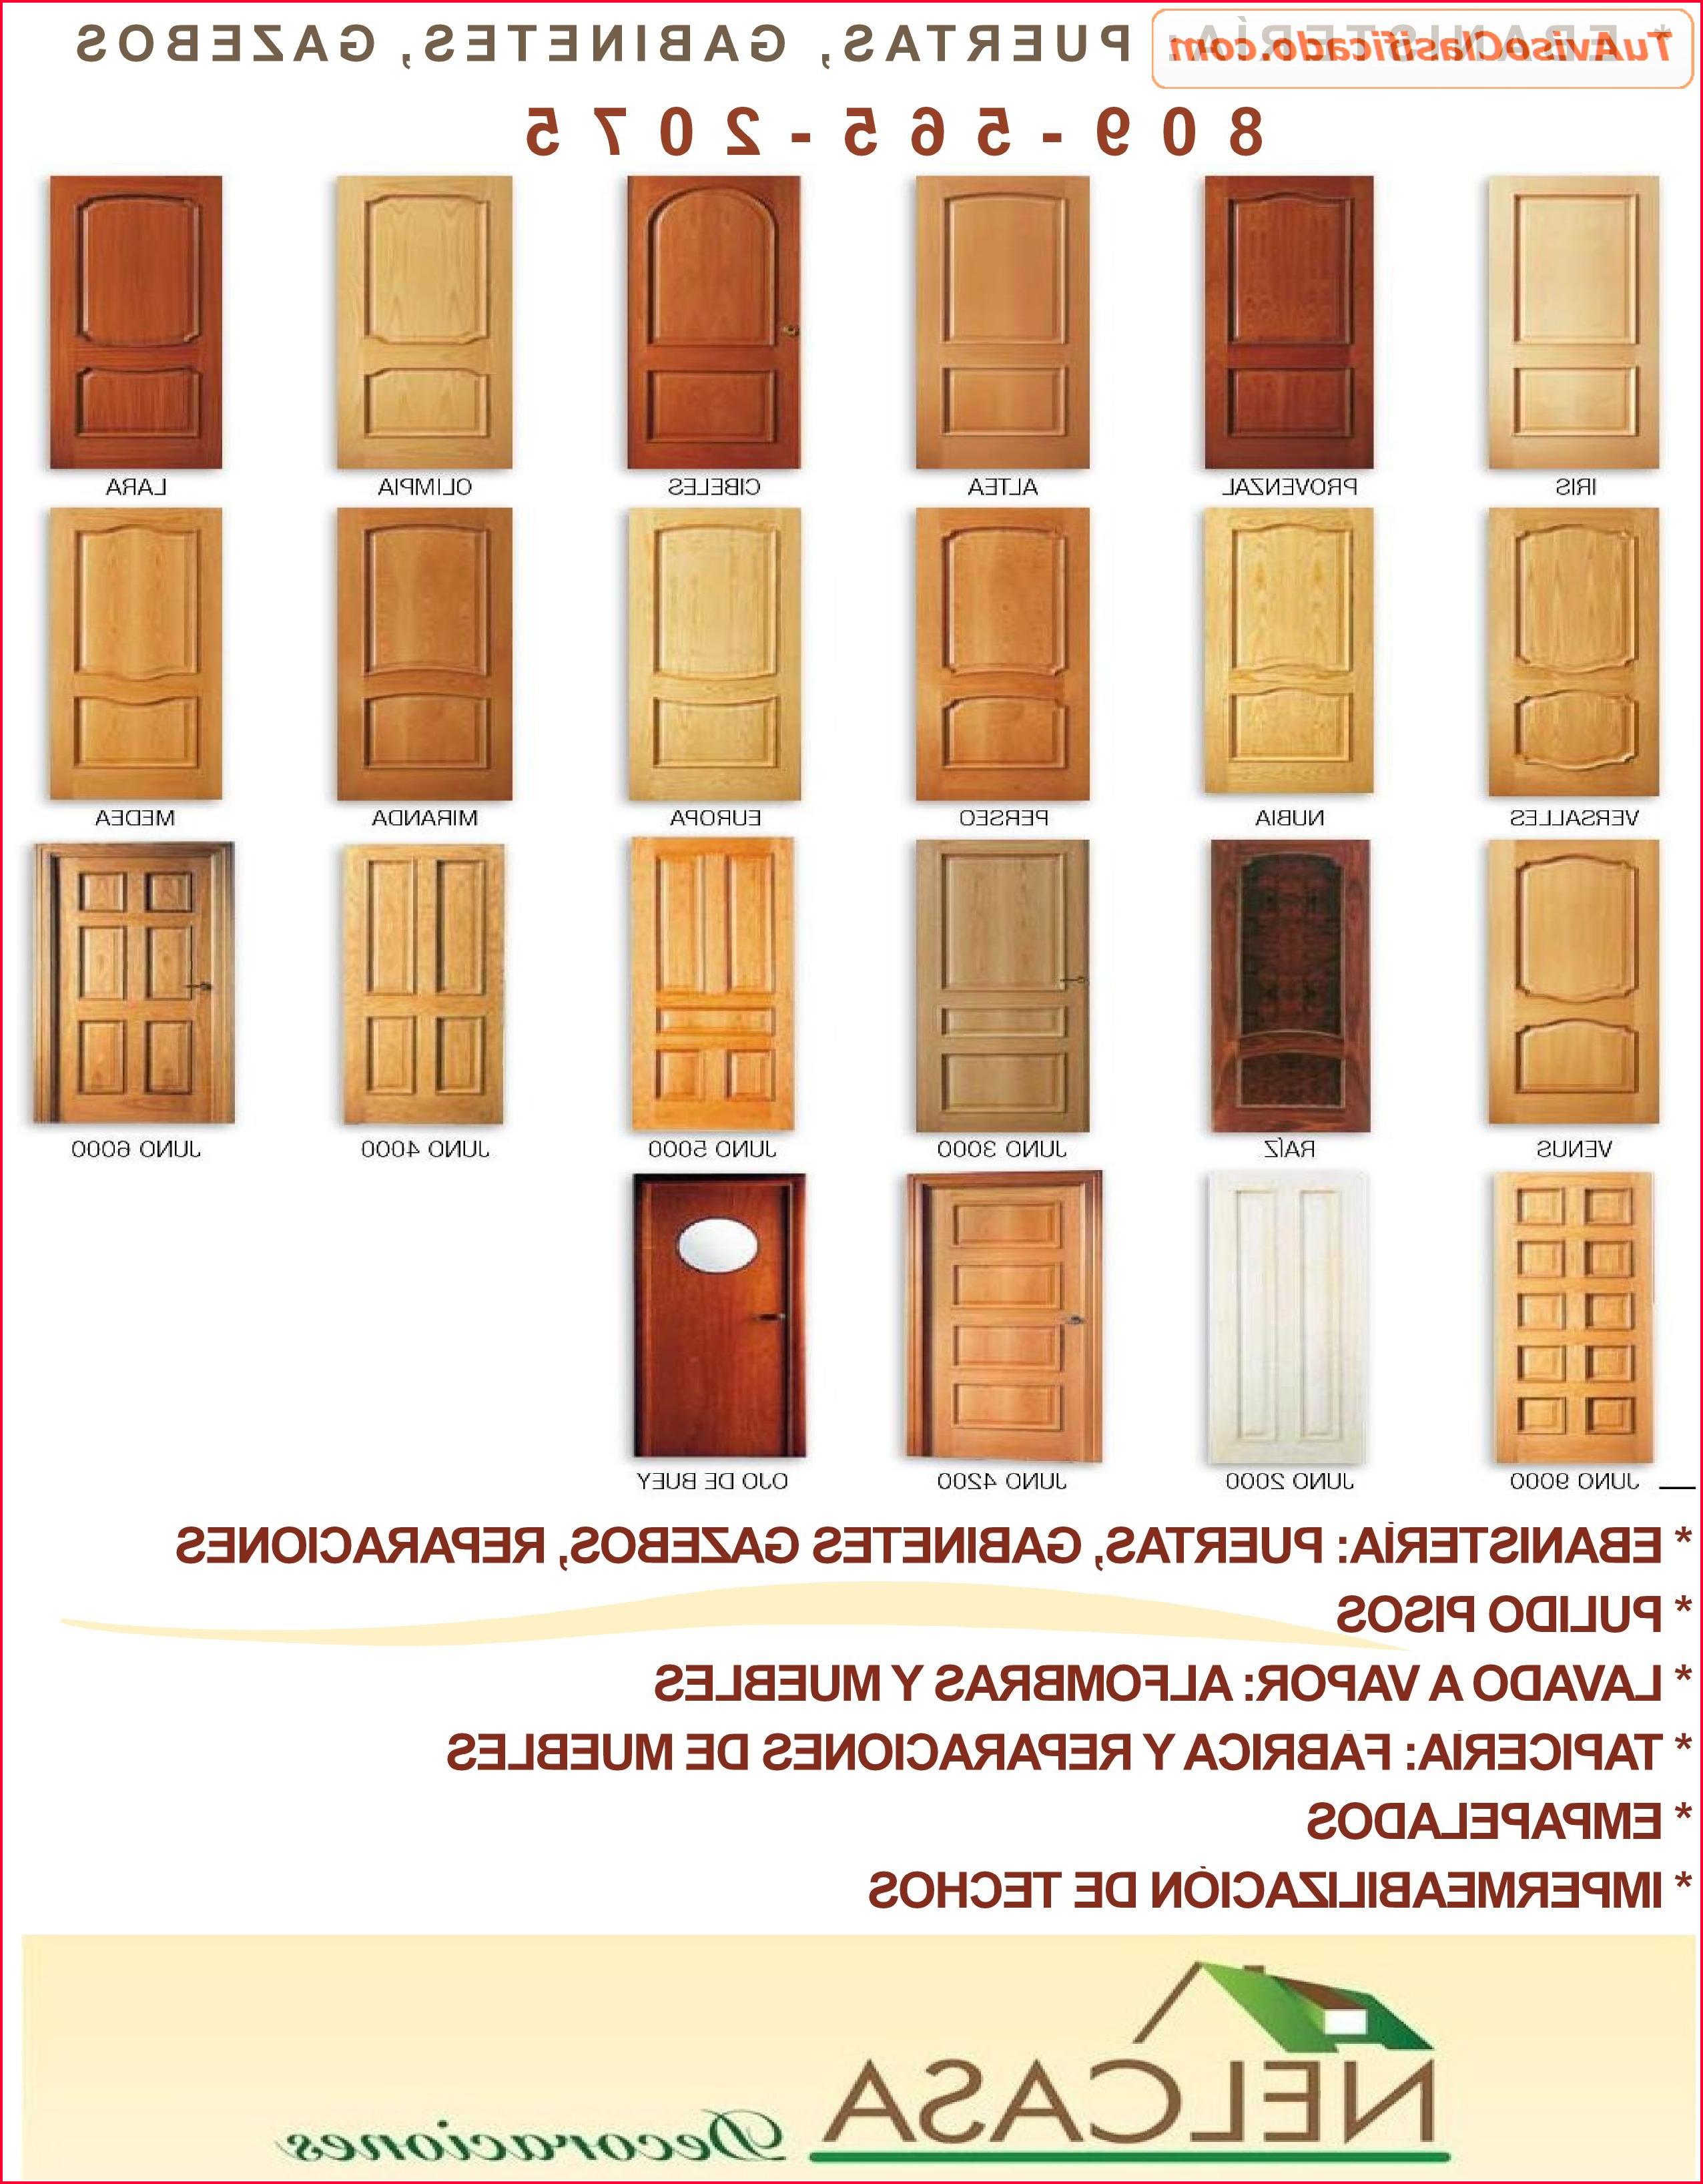 Puertas Muebles Cocina 3id6 Puertas Muebles Cocina FabricaciN ...